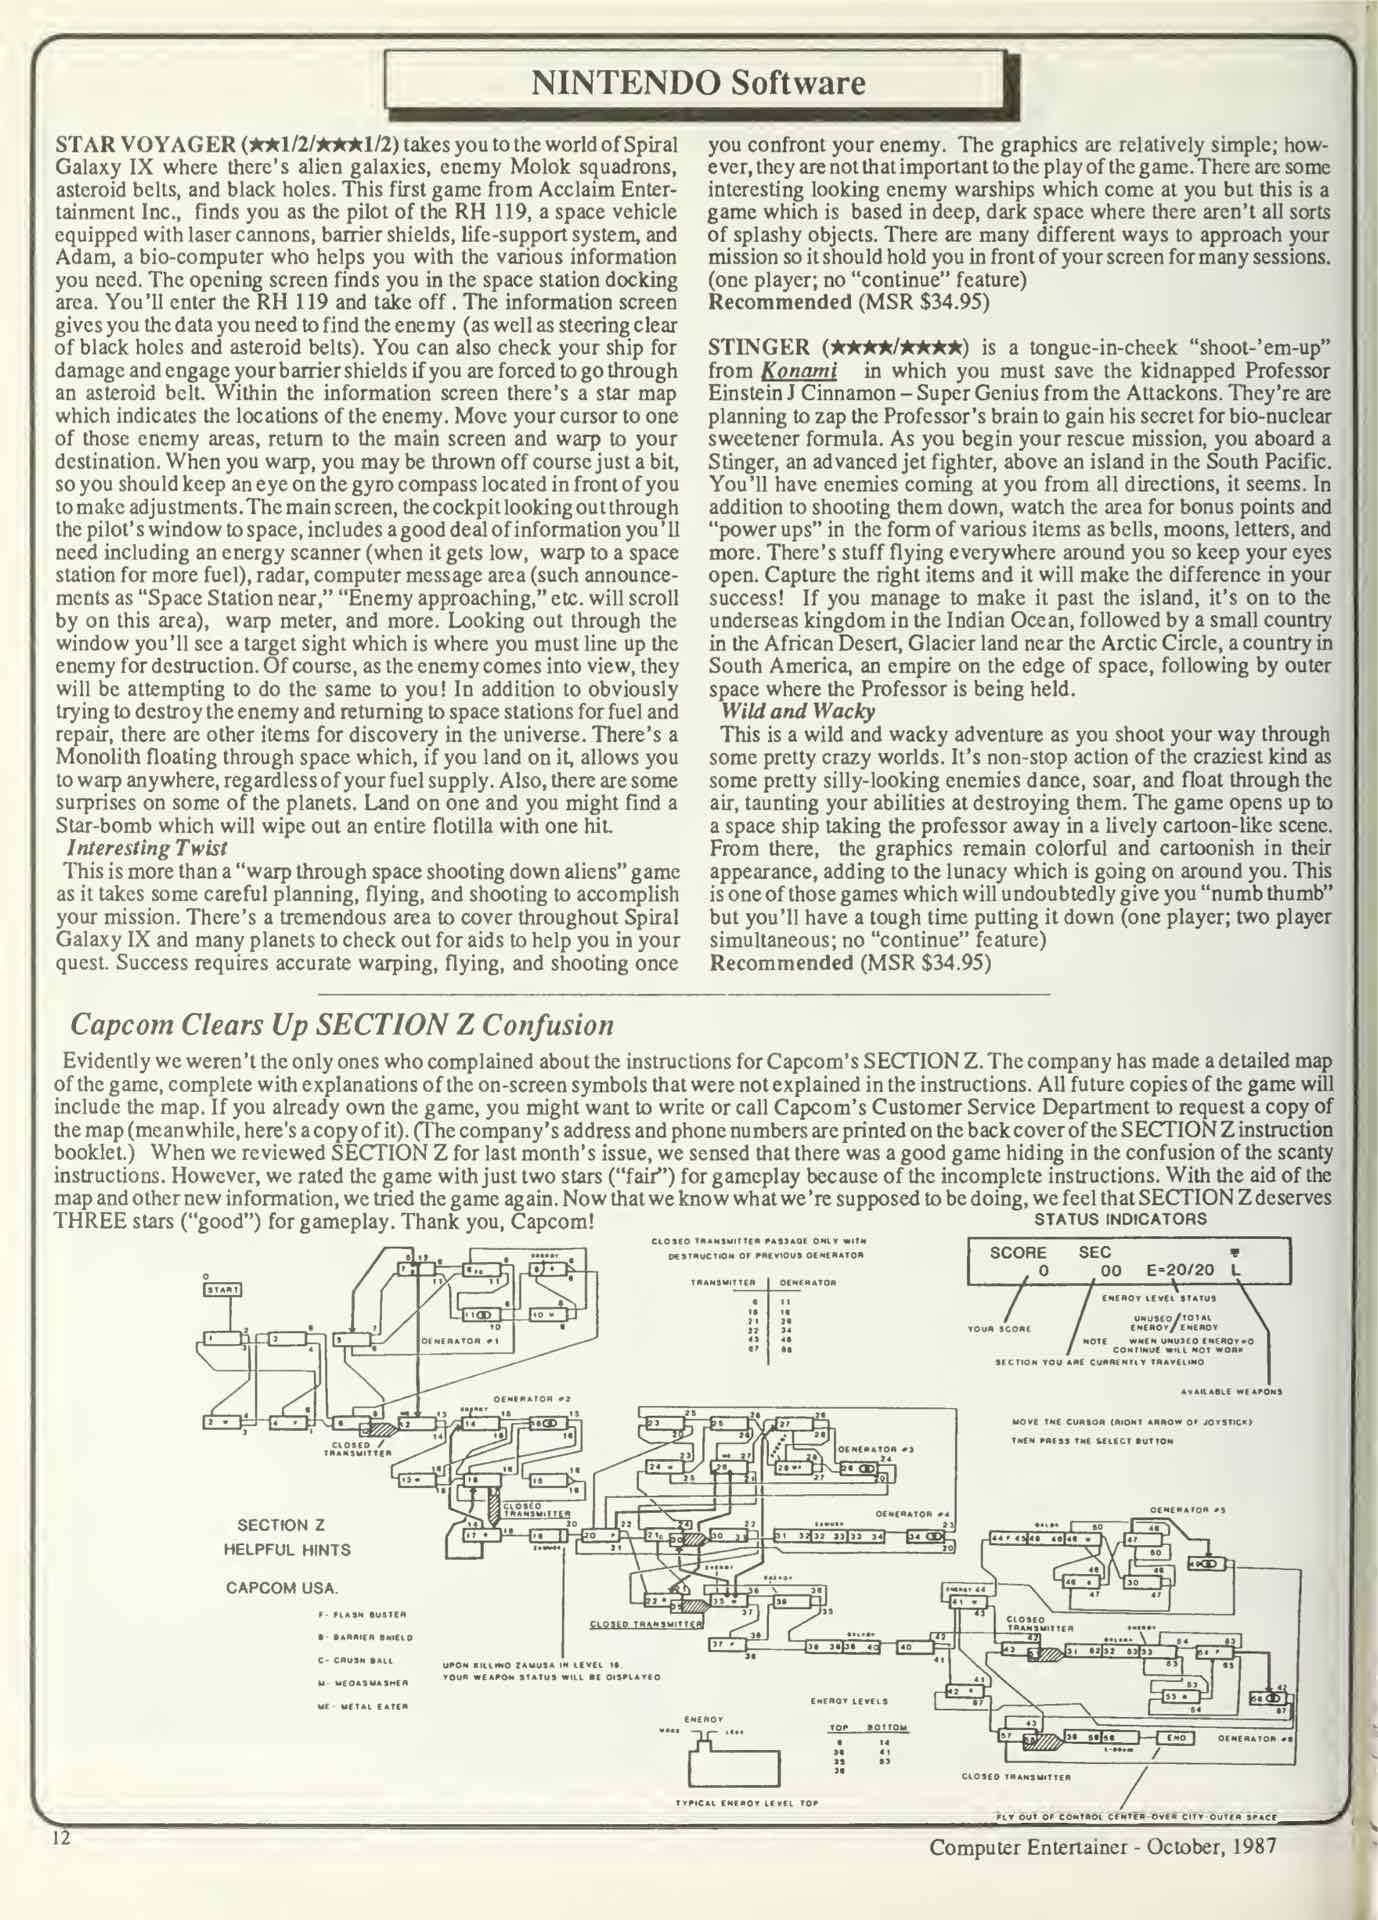 Computer Entertainer - October 1987 - p12